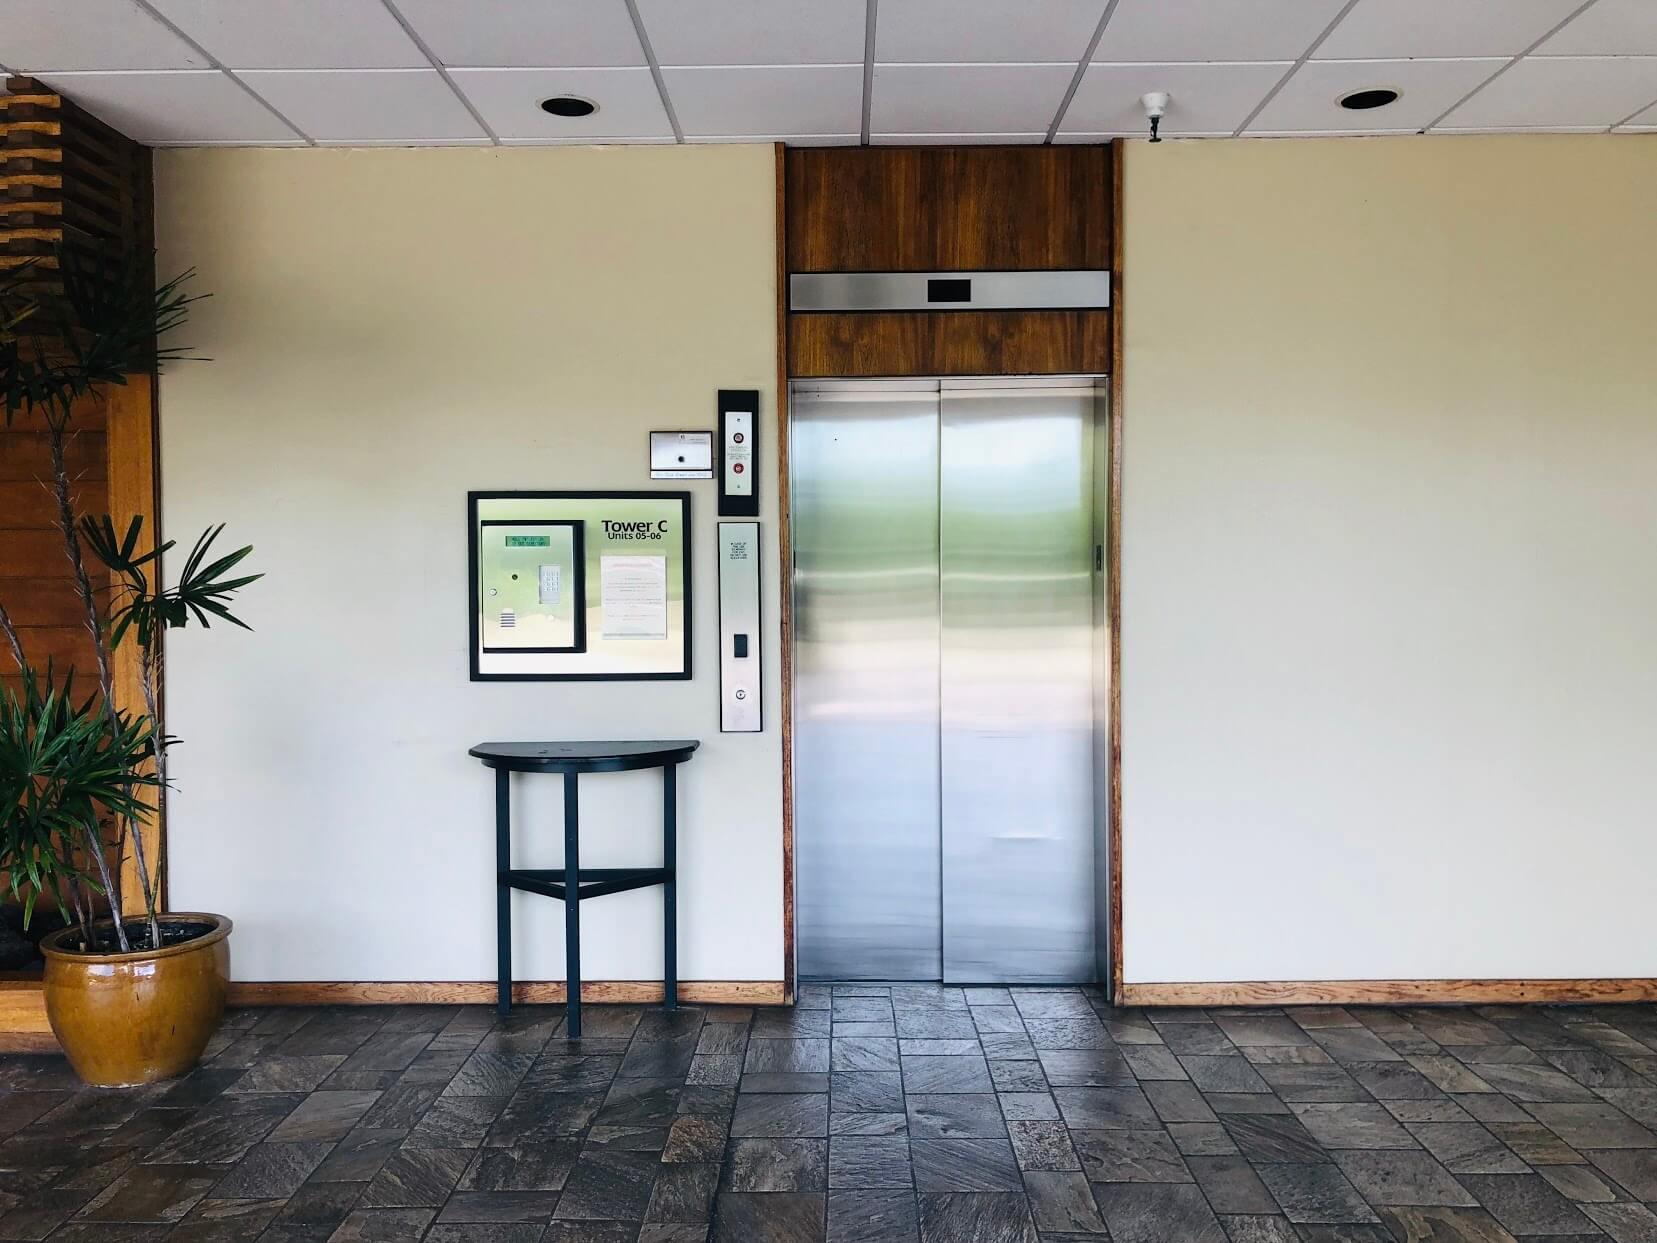 Naniwa Gardensのエレベーター